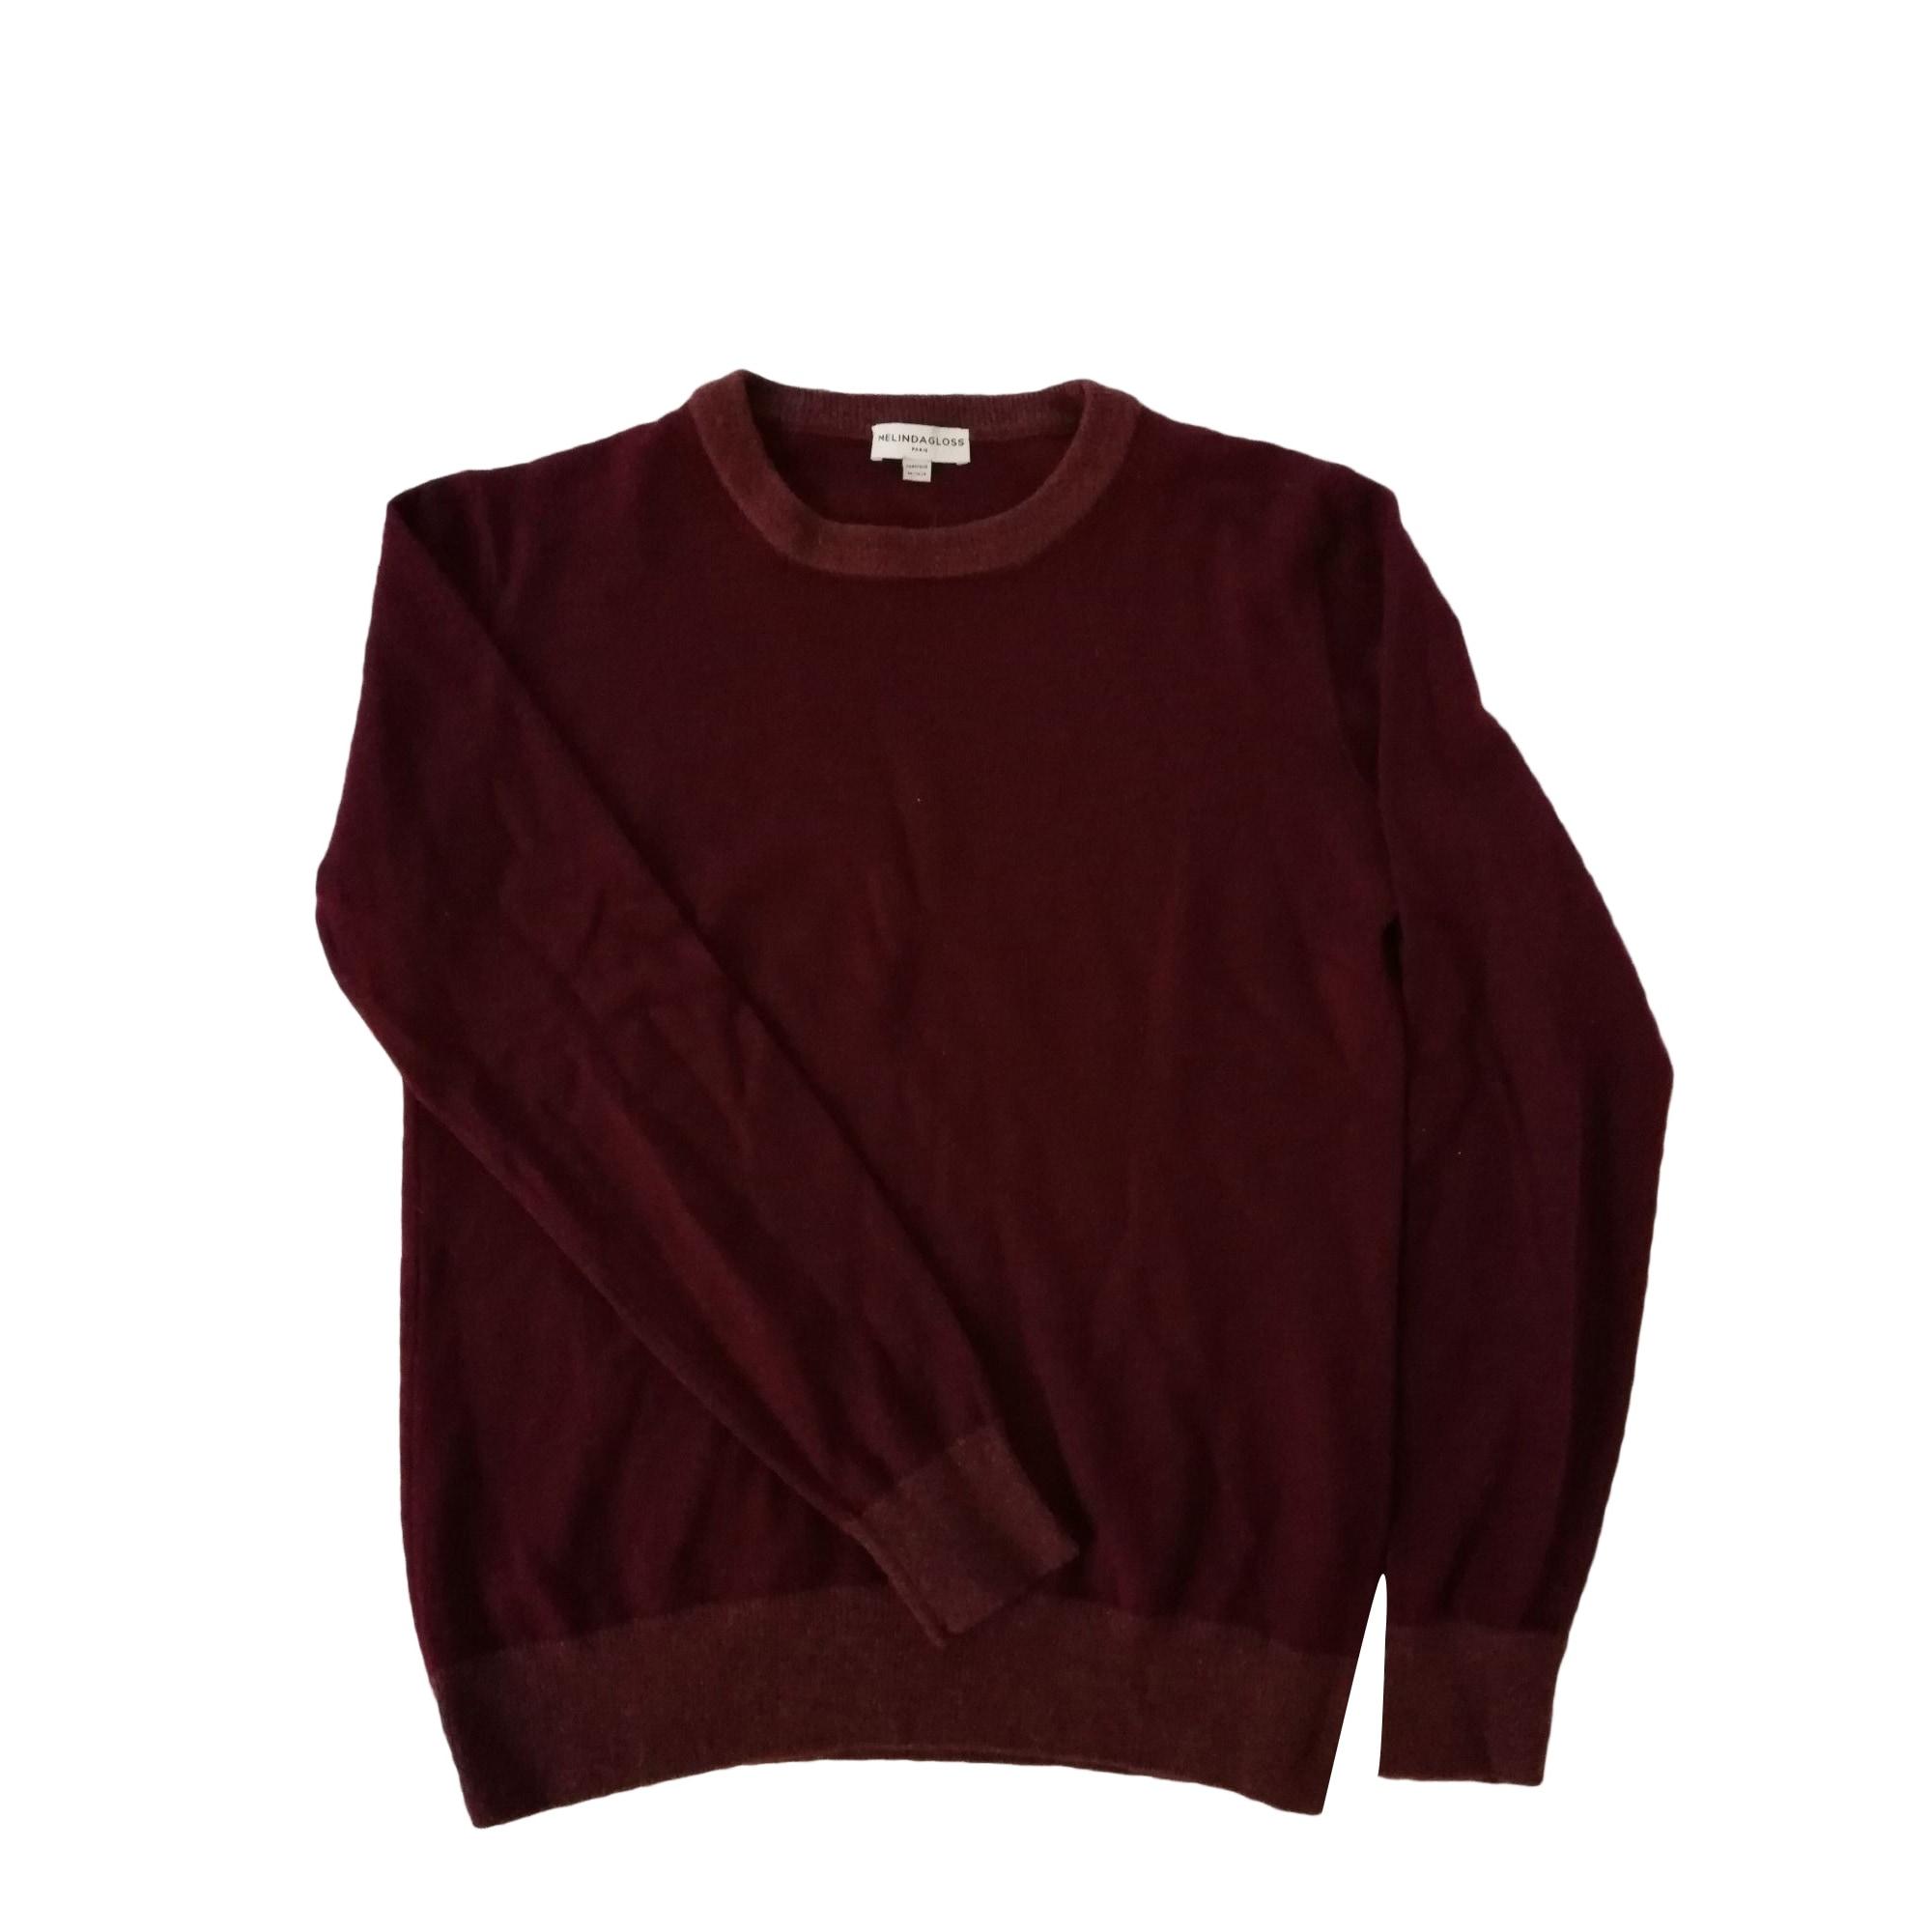 Sweater MELINDA GLOSS Red, burgundy